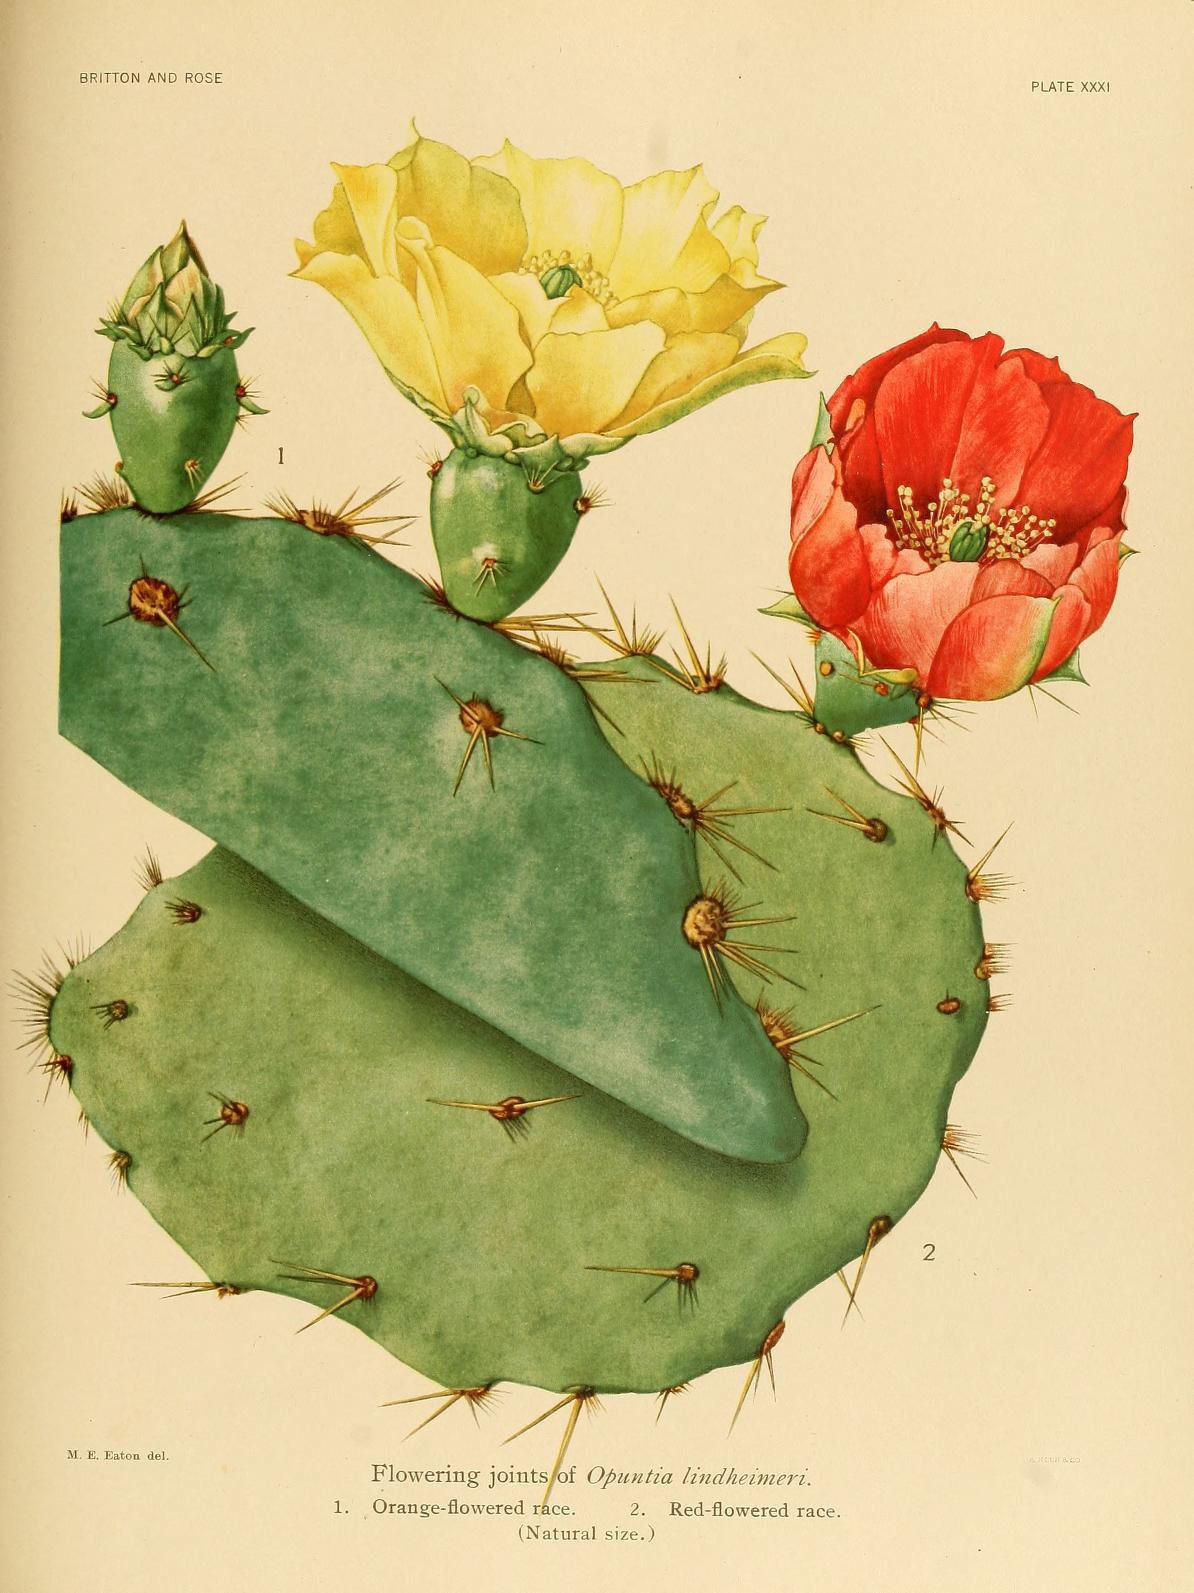 Image of Texas pricklypear